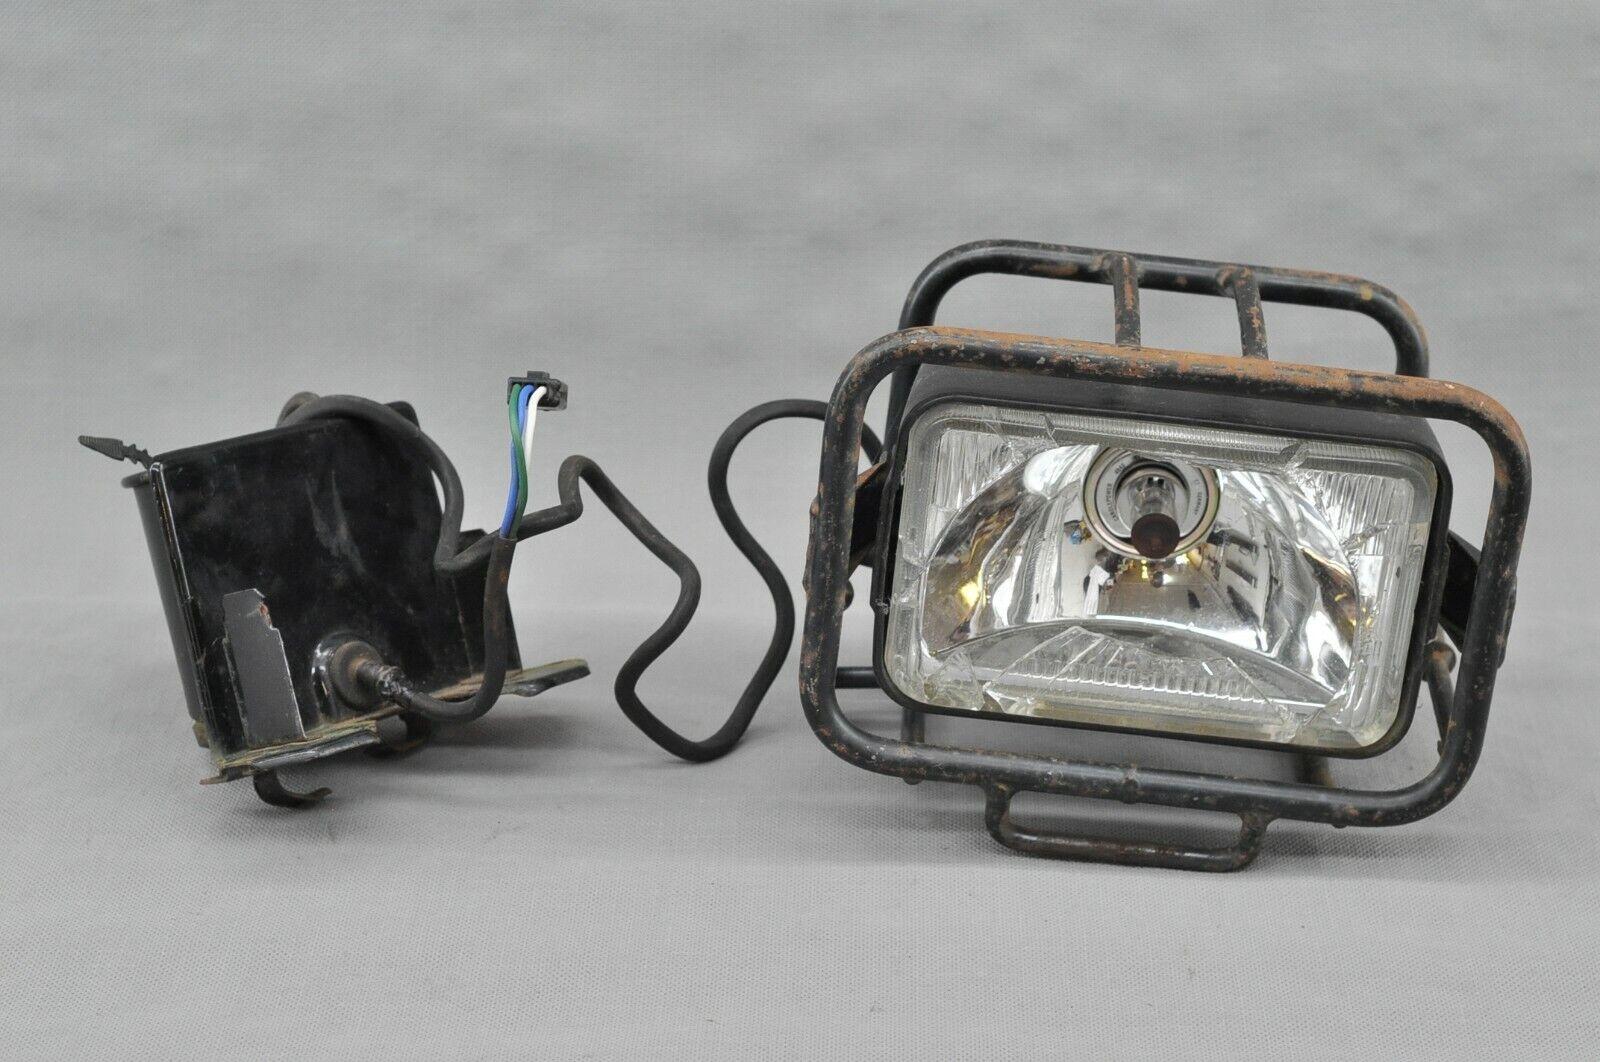 1985 1986 1987 Honda ATC 250ES ATC250 BIG RED Removable Headlight Head Light